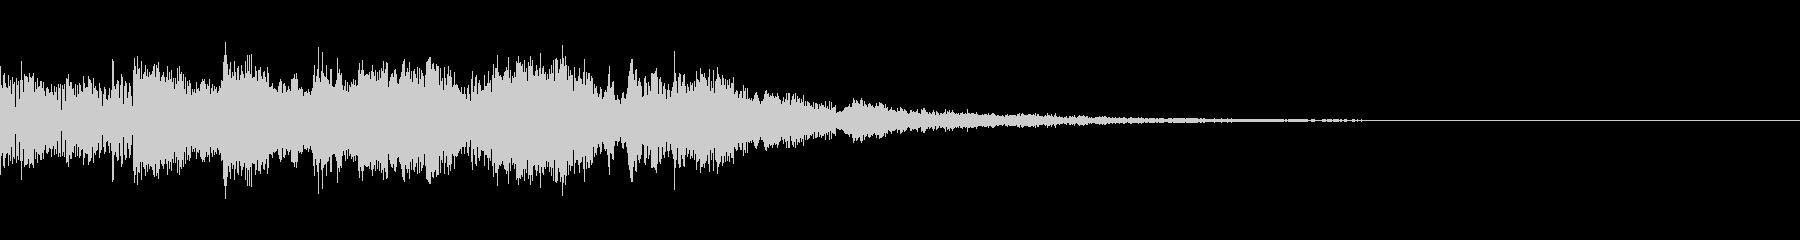 Synth Arpeggio Jingle 1の未再生の波形